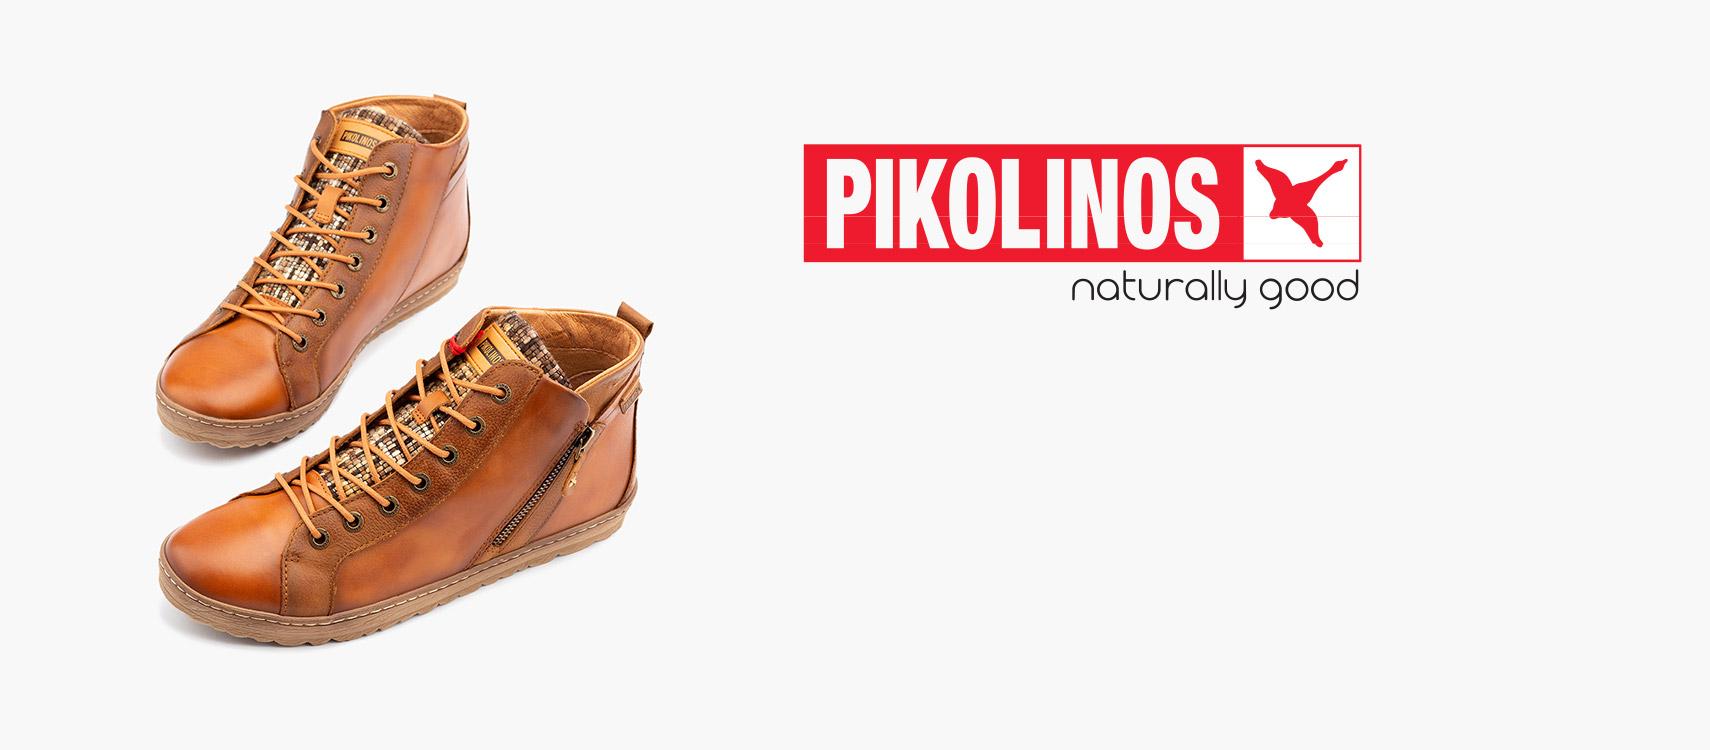 Spanish Shoes Pikolinos